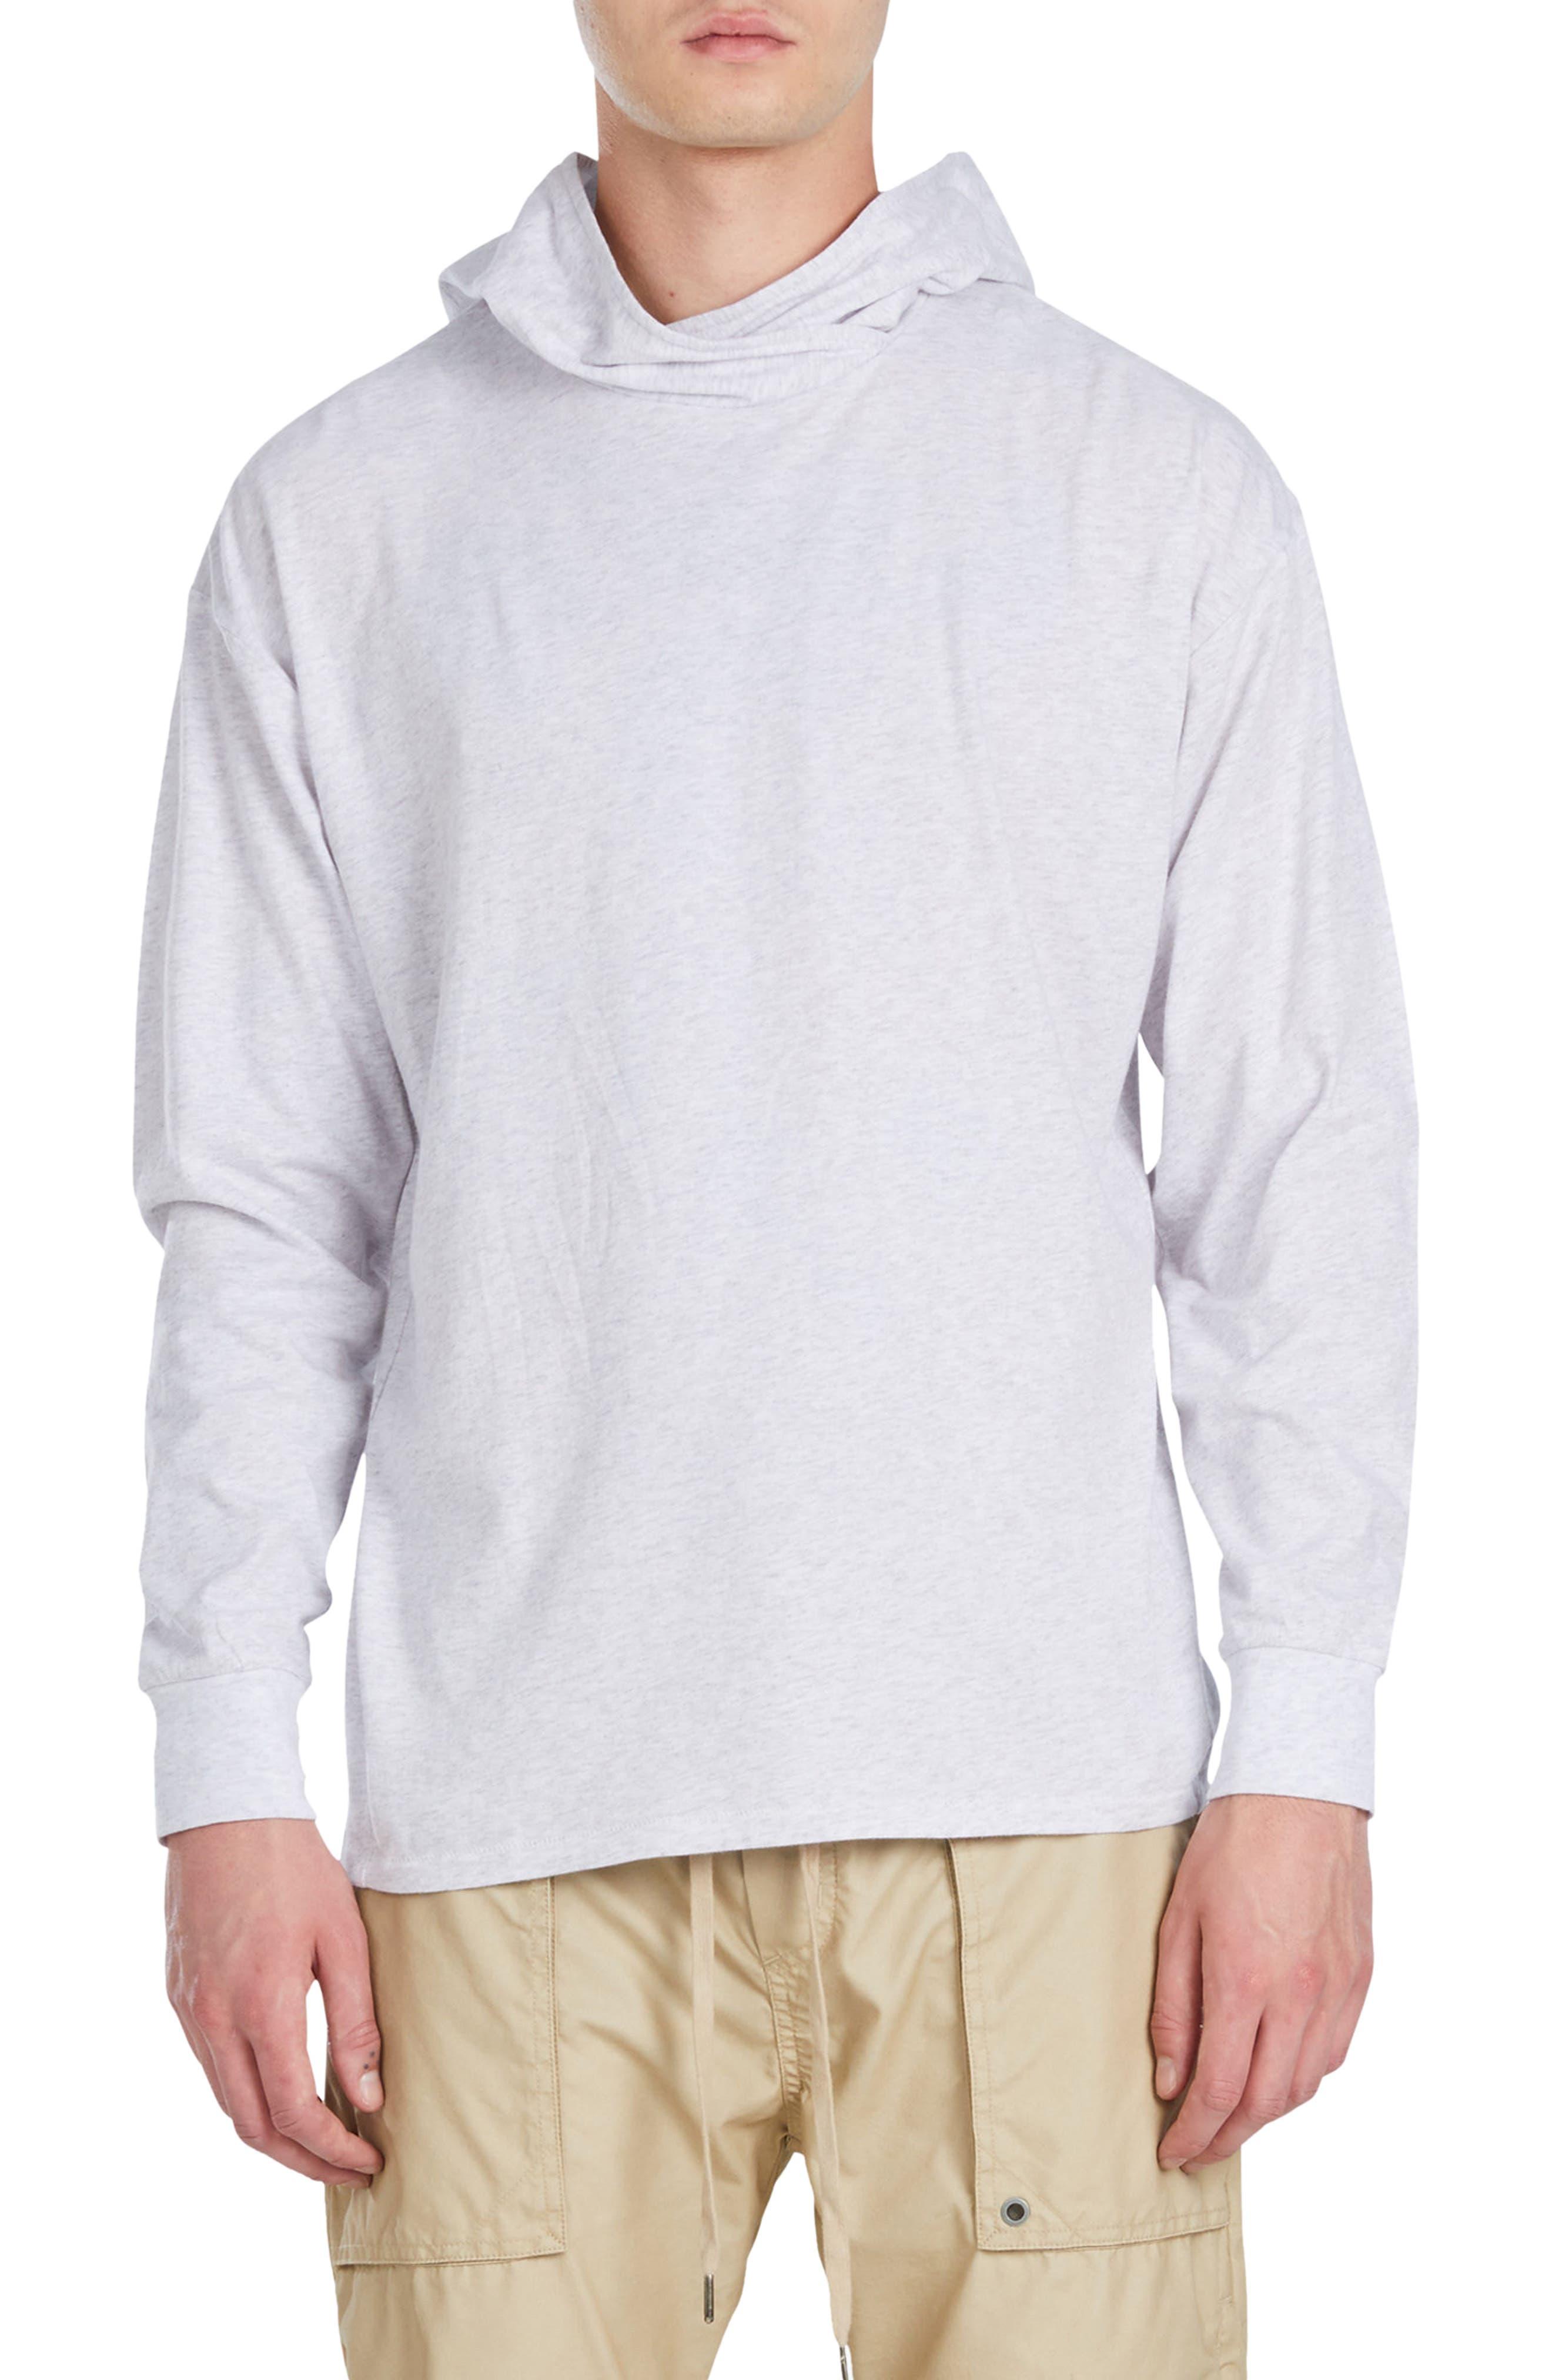 Rugger Long Sleeve Hooded T-Shirt,                             Main thumbnail 1, color,                             051